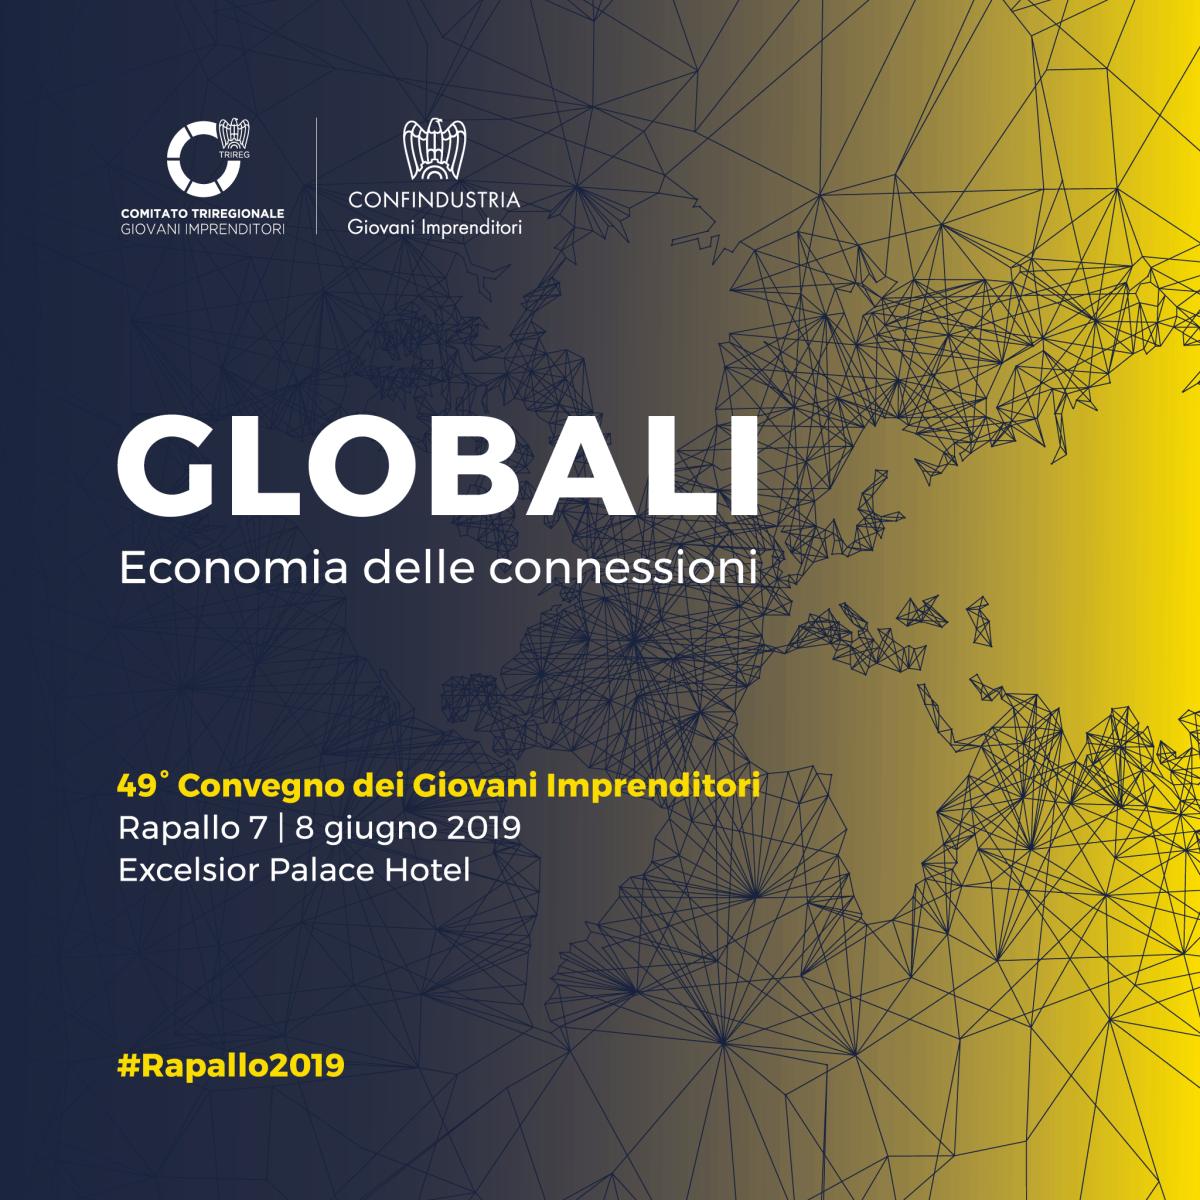 Globali Rapallo 49